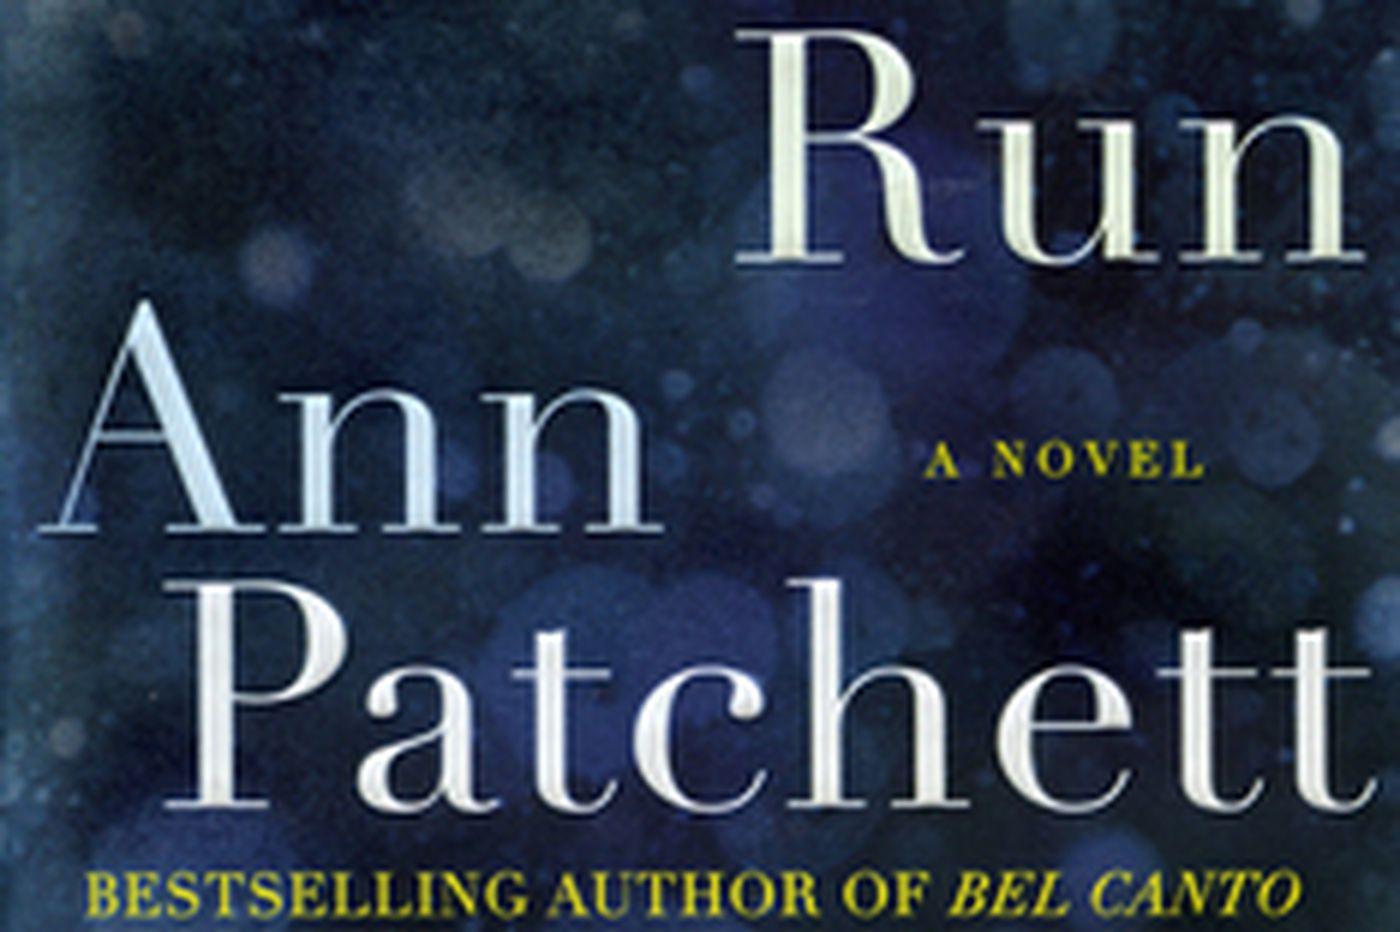 Follow the advice of Patchett's latest title